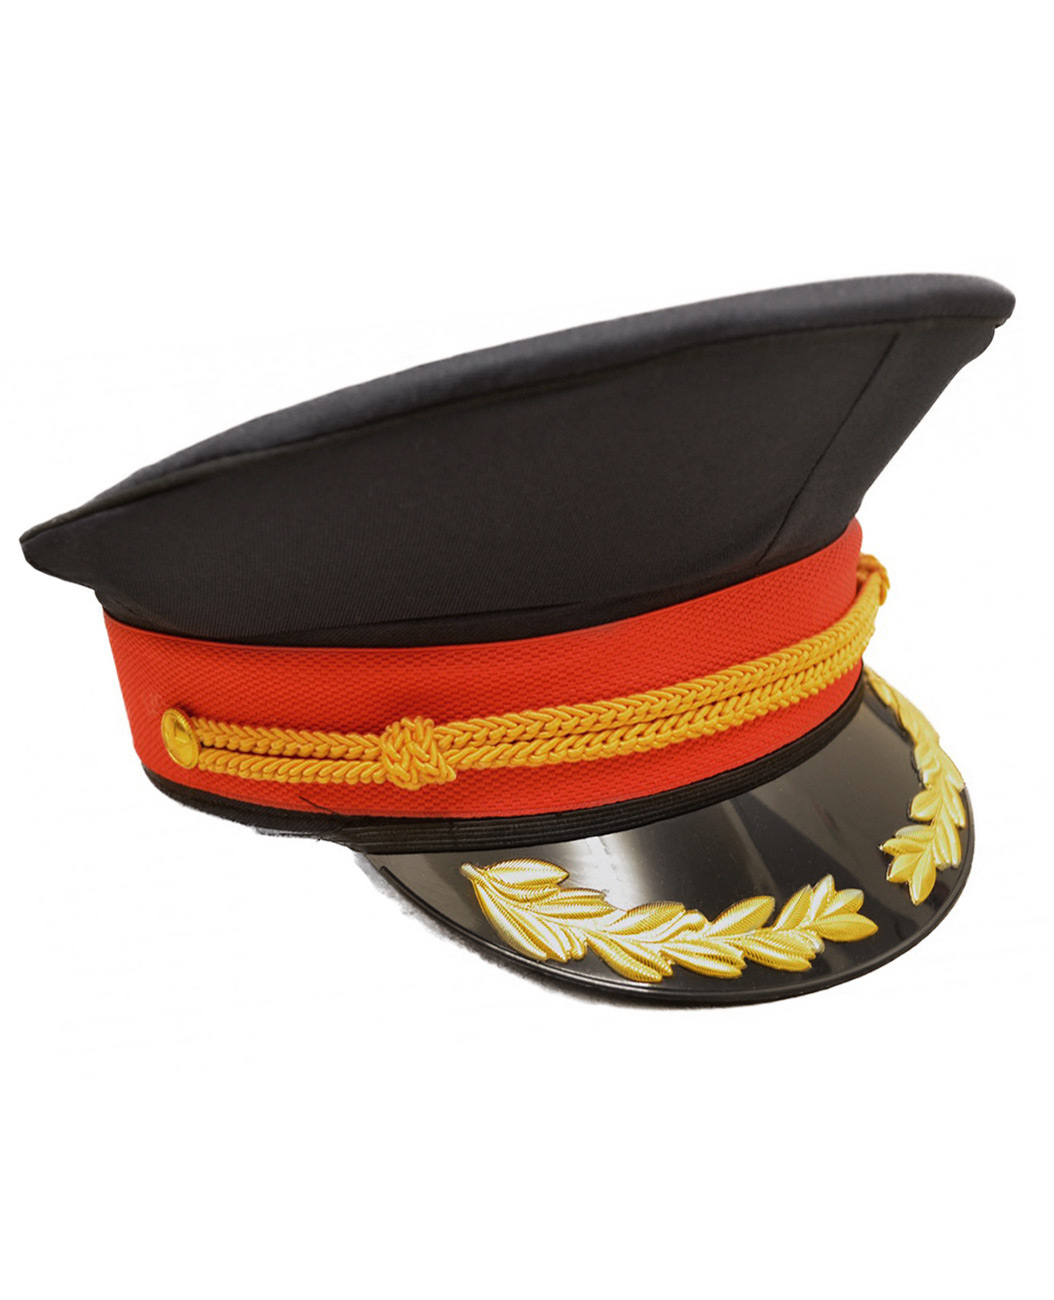 Military Black dark blue red hat cap with golden stripes 8391c6ee4cd